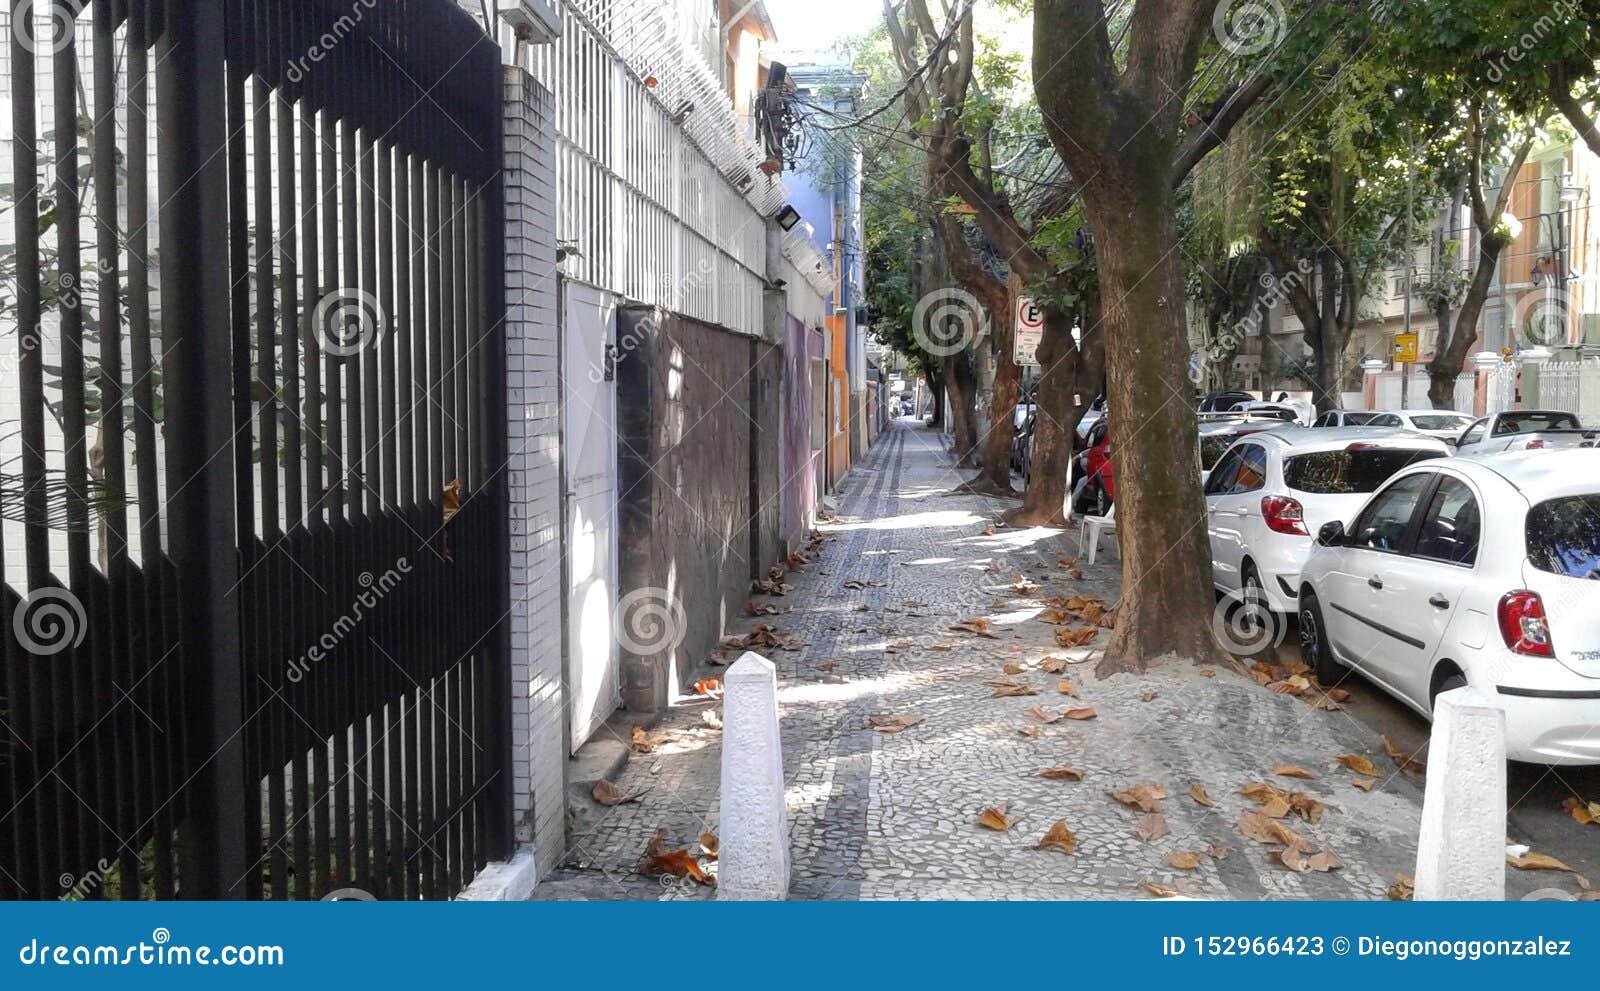 Brazil - Rio de Janeiro - Empty Street - Cars - Trees - Leaves - Cityscape